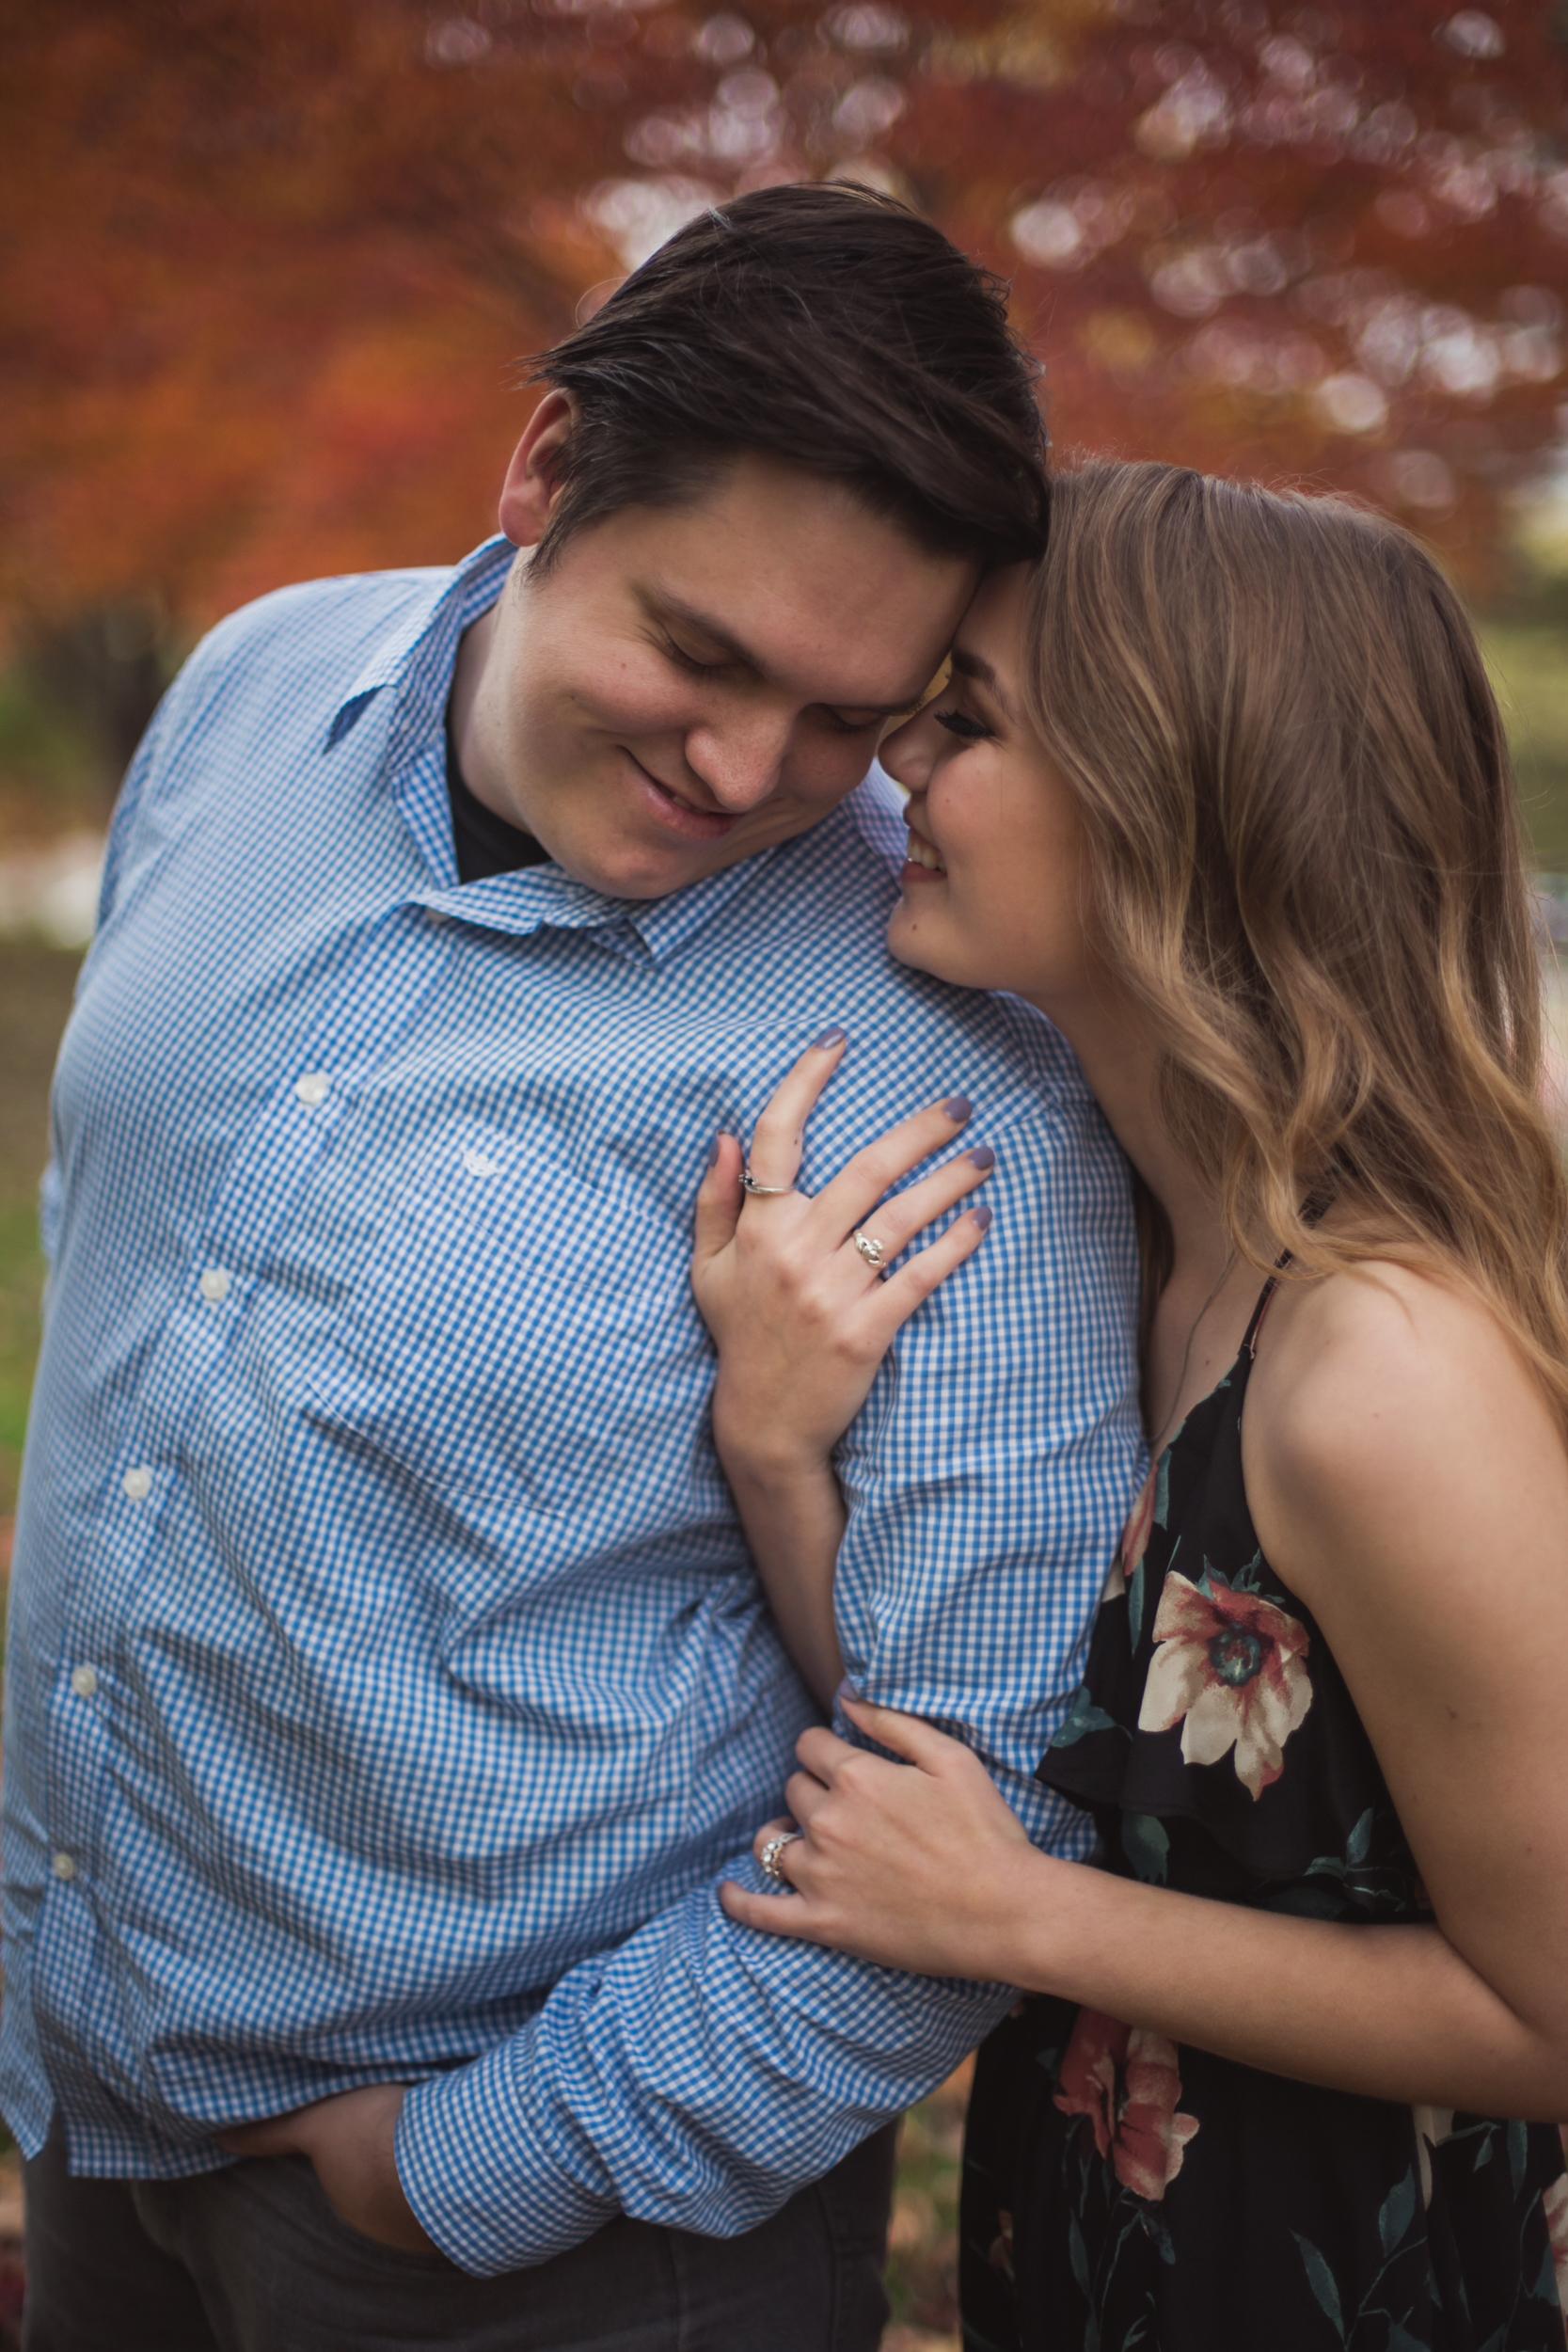 Fort Snelling Elopement St. Paul, MN, Fort Snelling Elopement, Military Elopement, Intimate Military Wedding, intimate elopement wedding-www.rachelsmak.com12.jpg